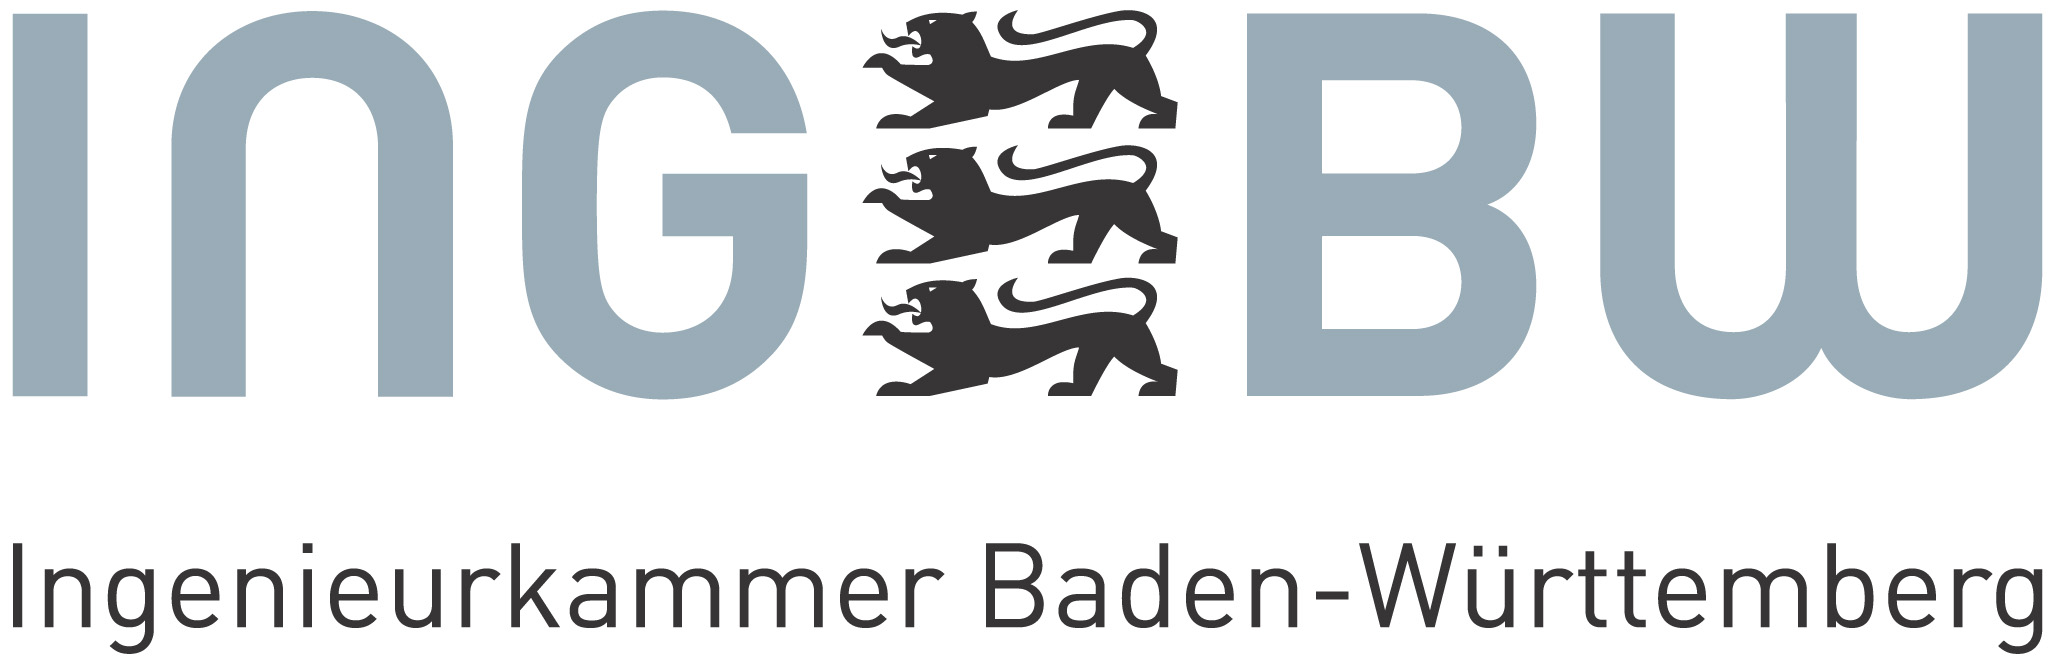 Ingenieurkammer Baden-Württemberg Logo